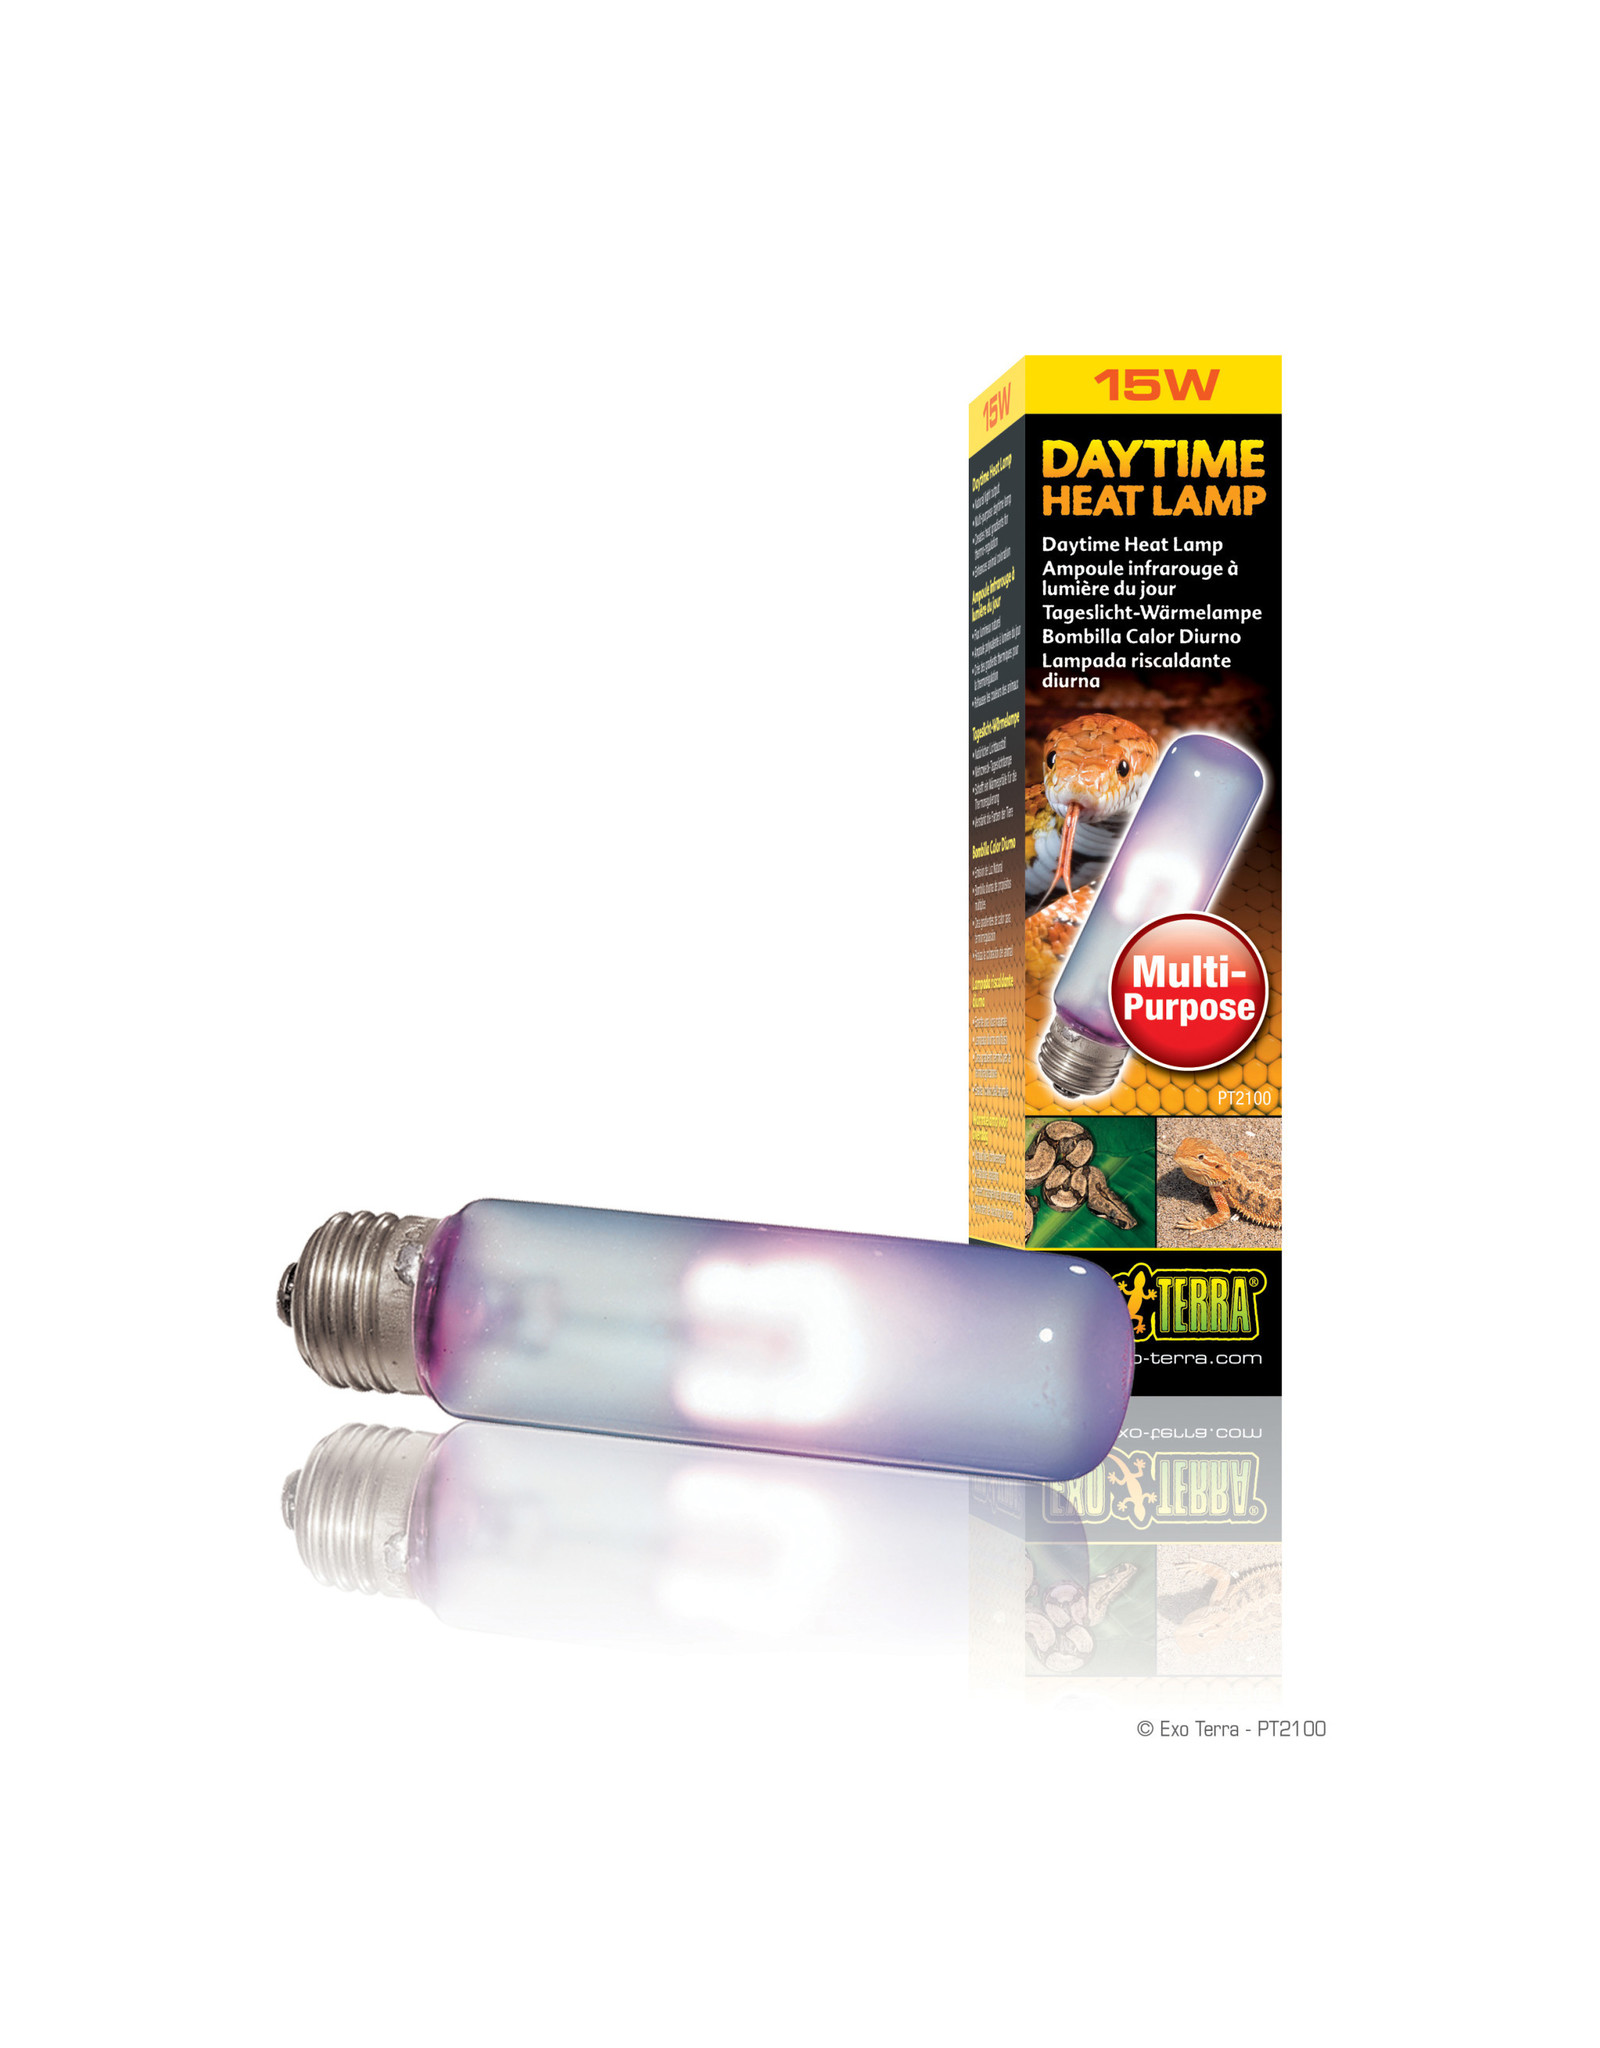 Exo Terra Daytime Heat Lamp T10/15W